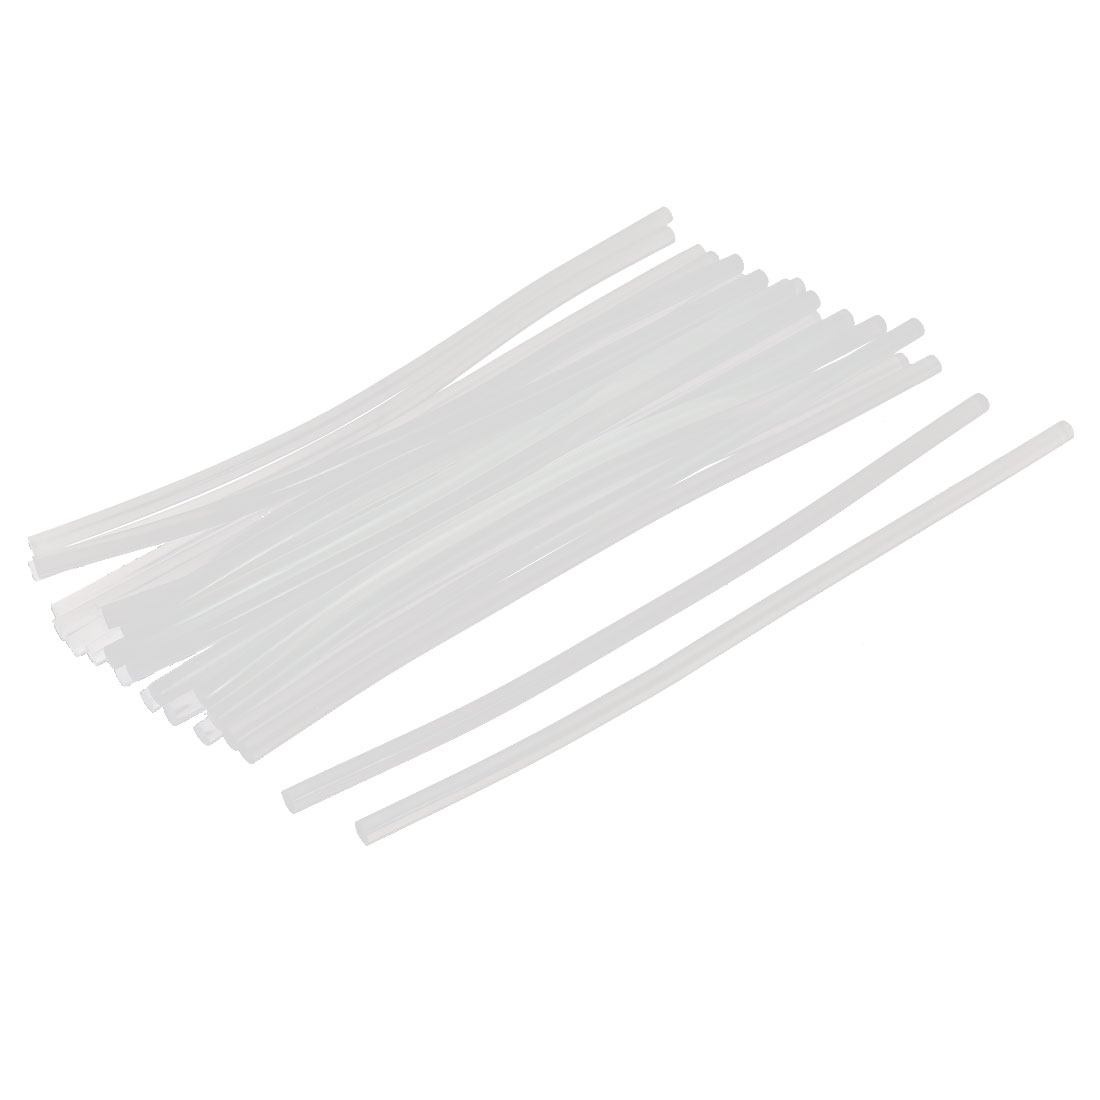 24 Pcs Clear White Hot Melt EVA Glue Adhesive Sticks 7x270mm